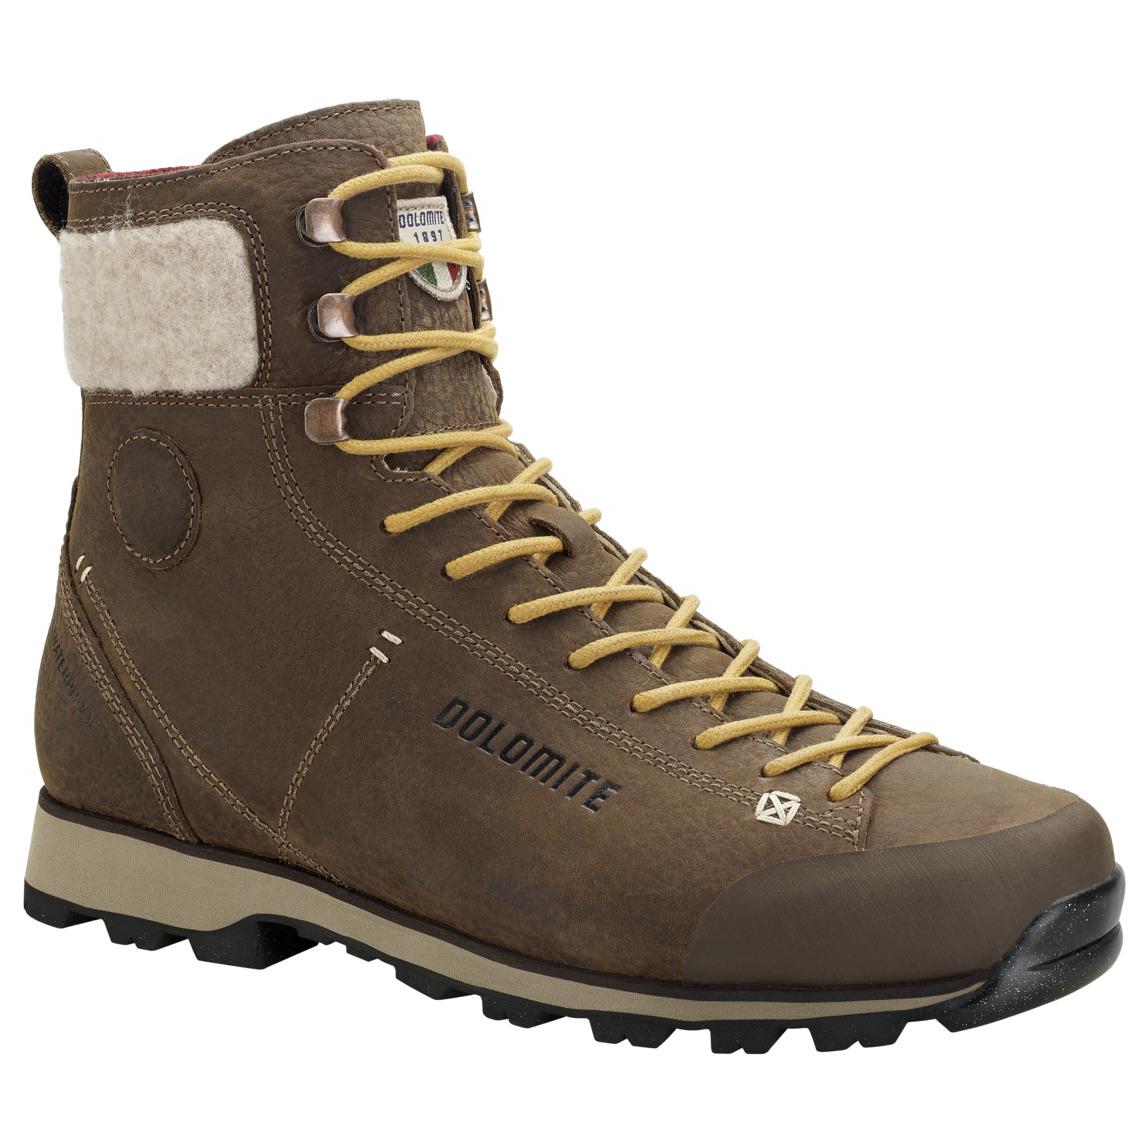 b23d60ed6da Dolomite shoe warm winter boots free jpg 1145x1145 Dolomite hiking boots